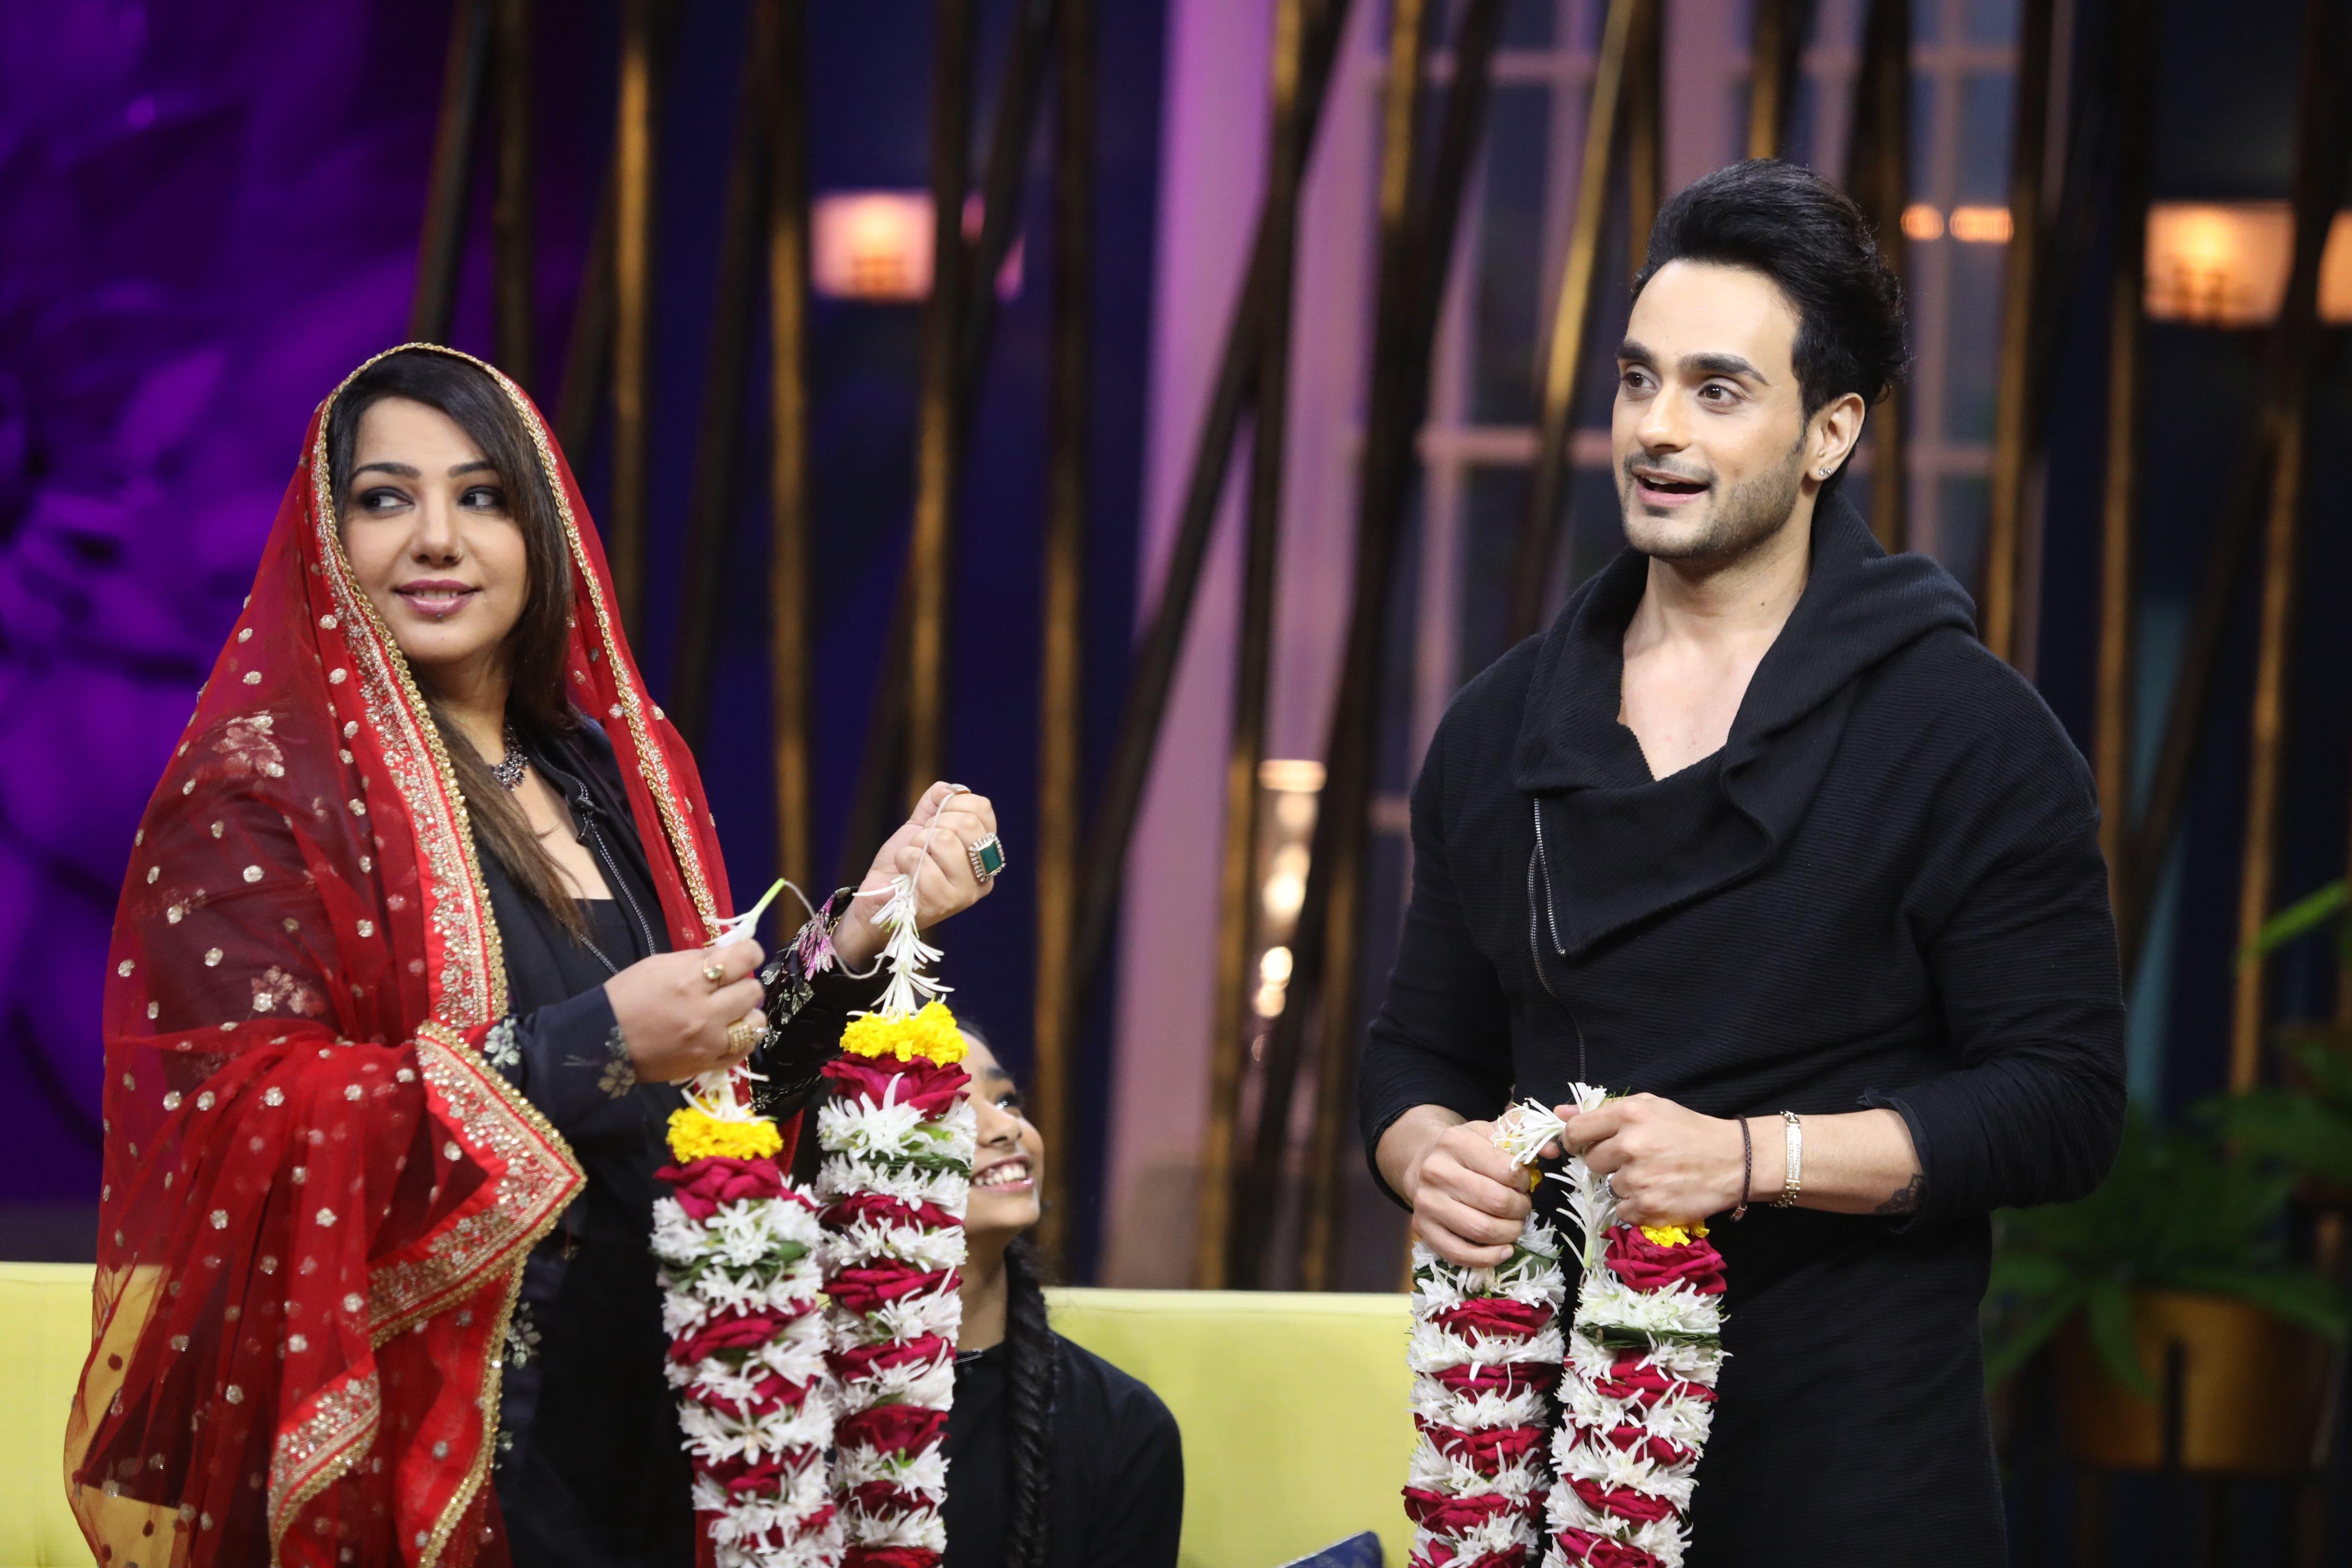 Angad Hasija of Bidaai fame gets married once again, and